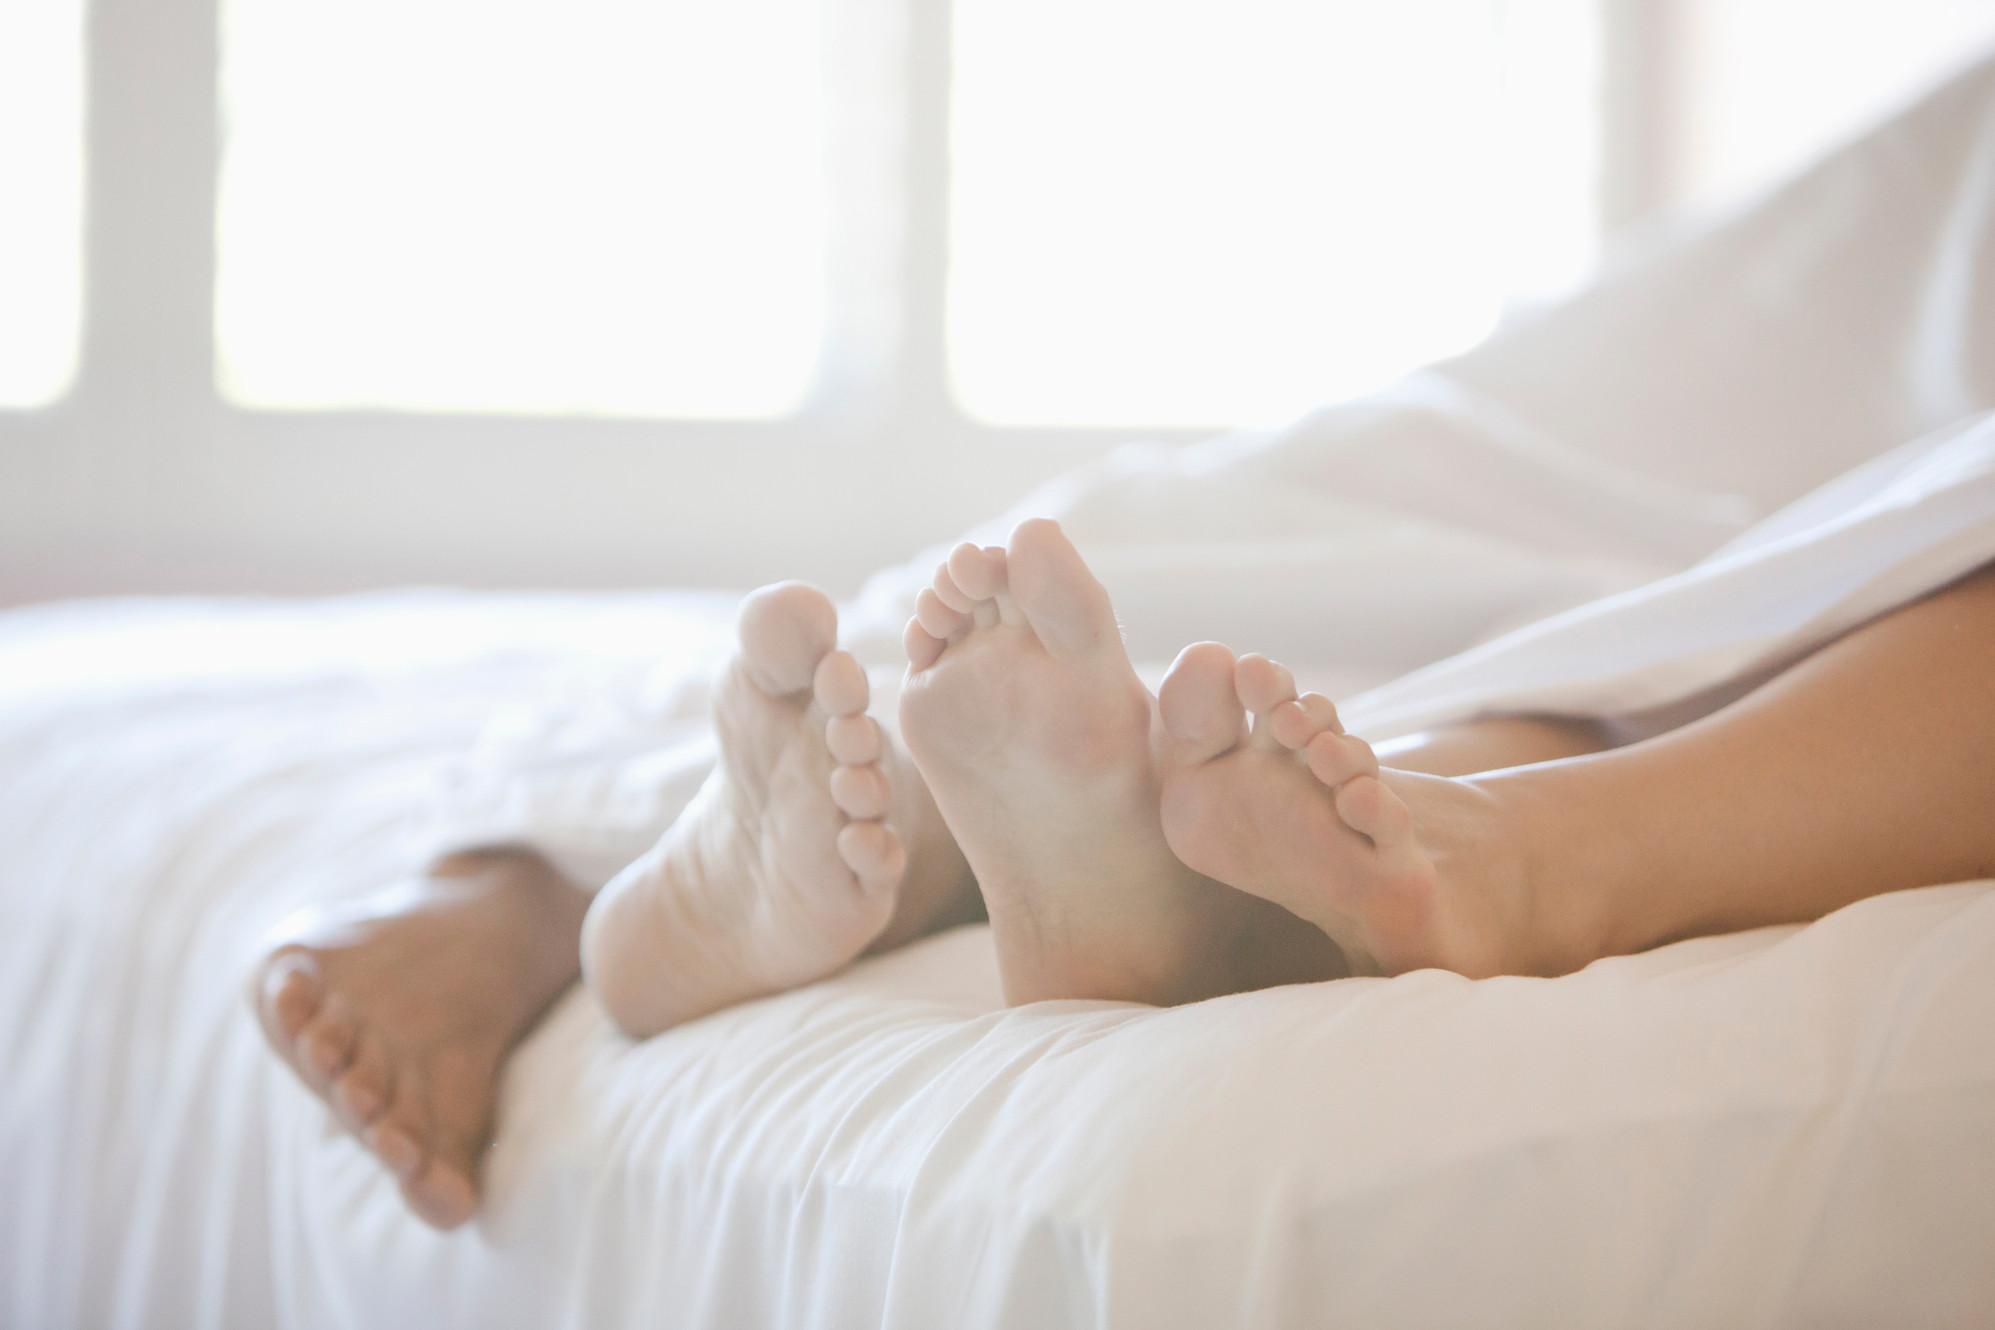 www.sexotherapie-bordeaux.fr